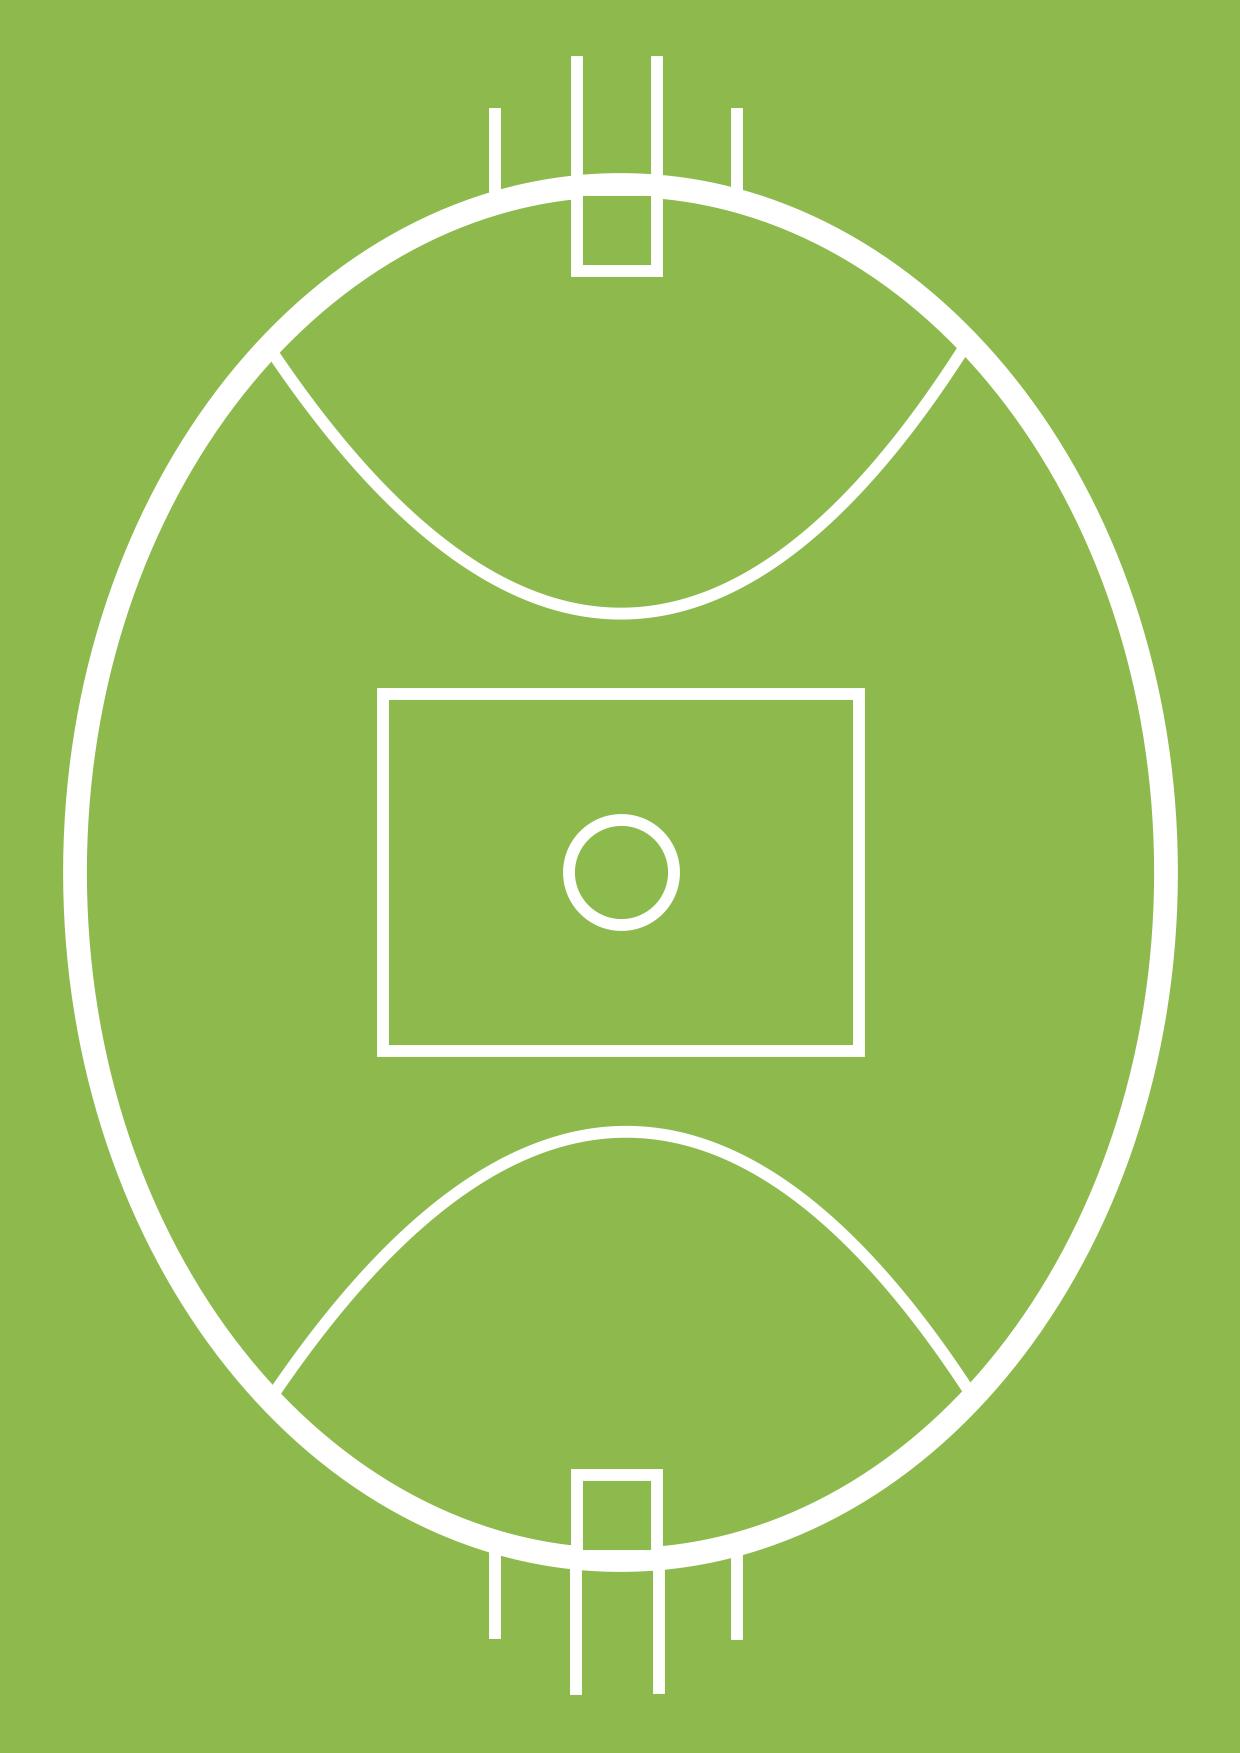 1240x1753 Fileaustralian Rules Football Field.png